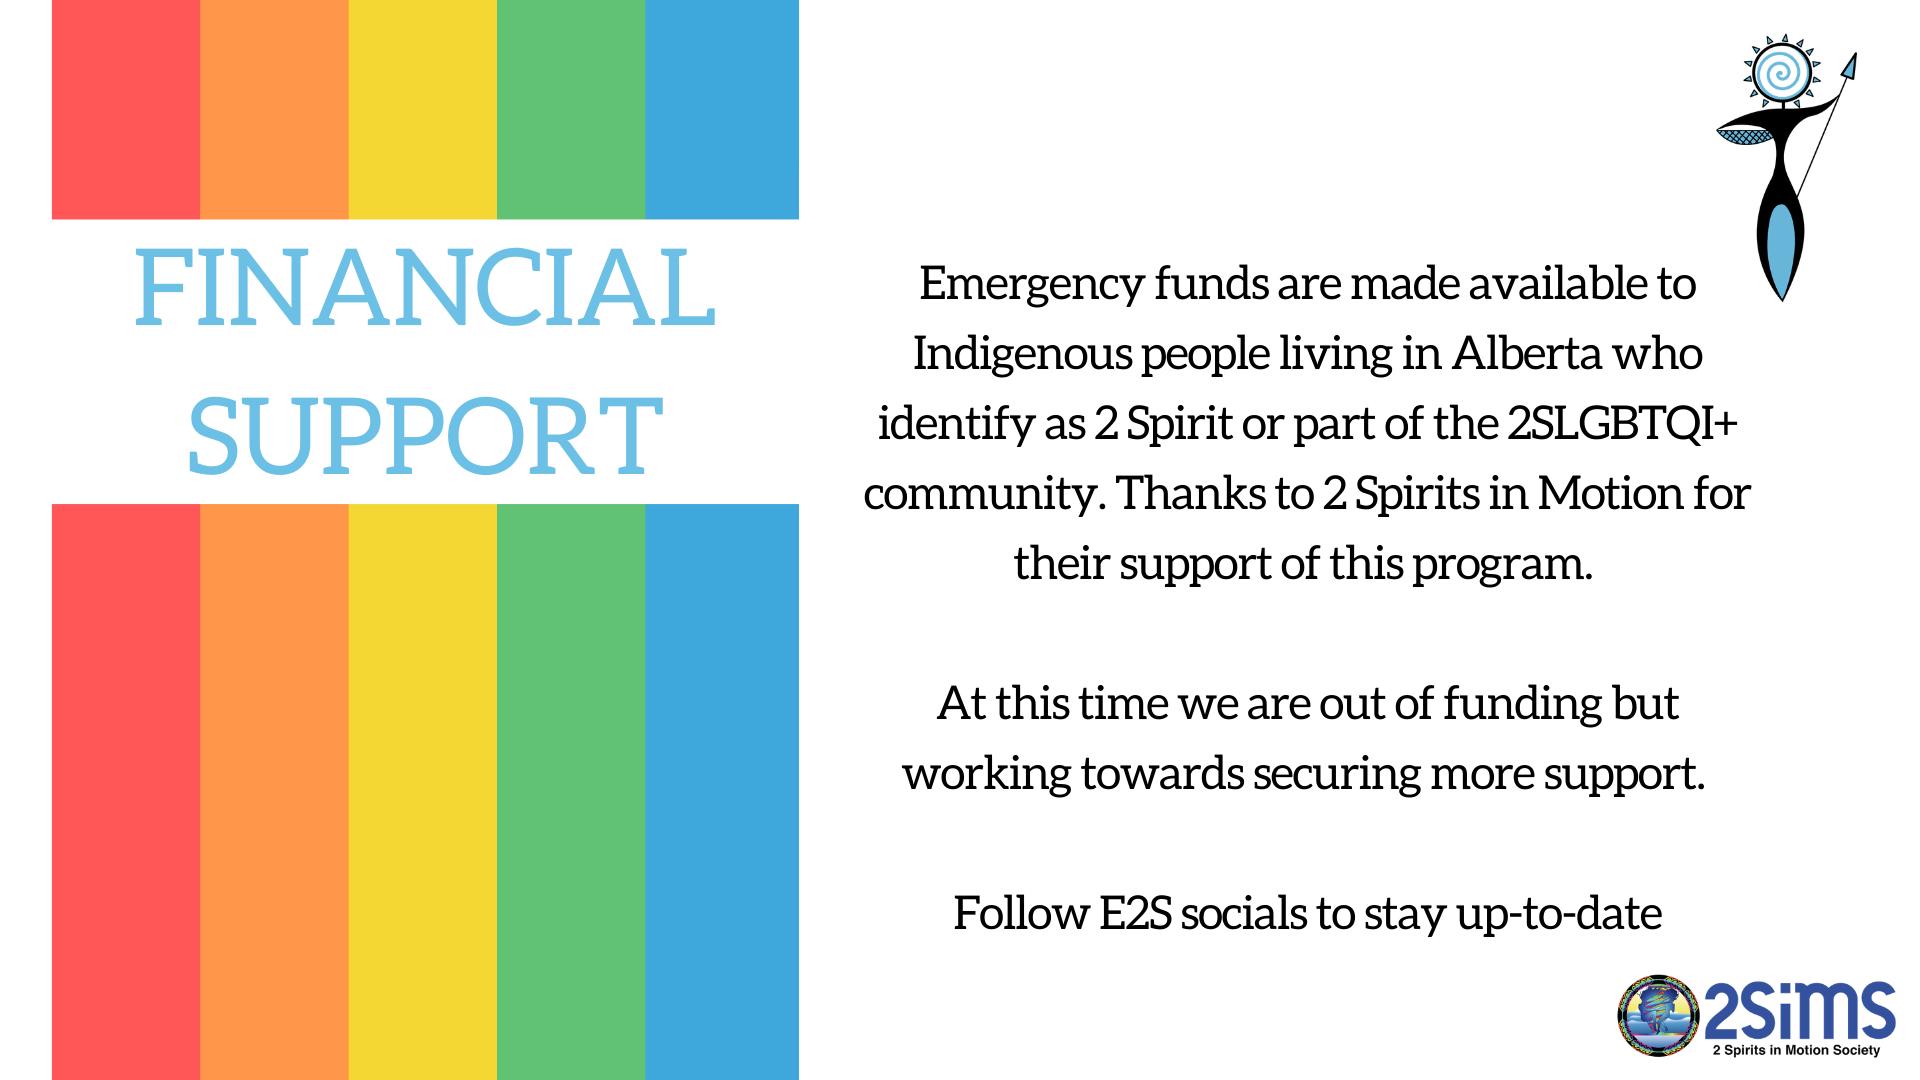 Website - Financial Support